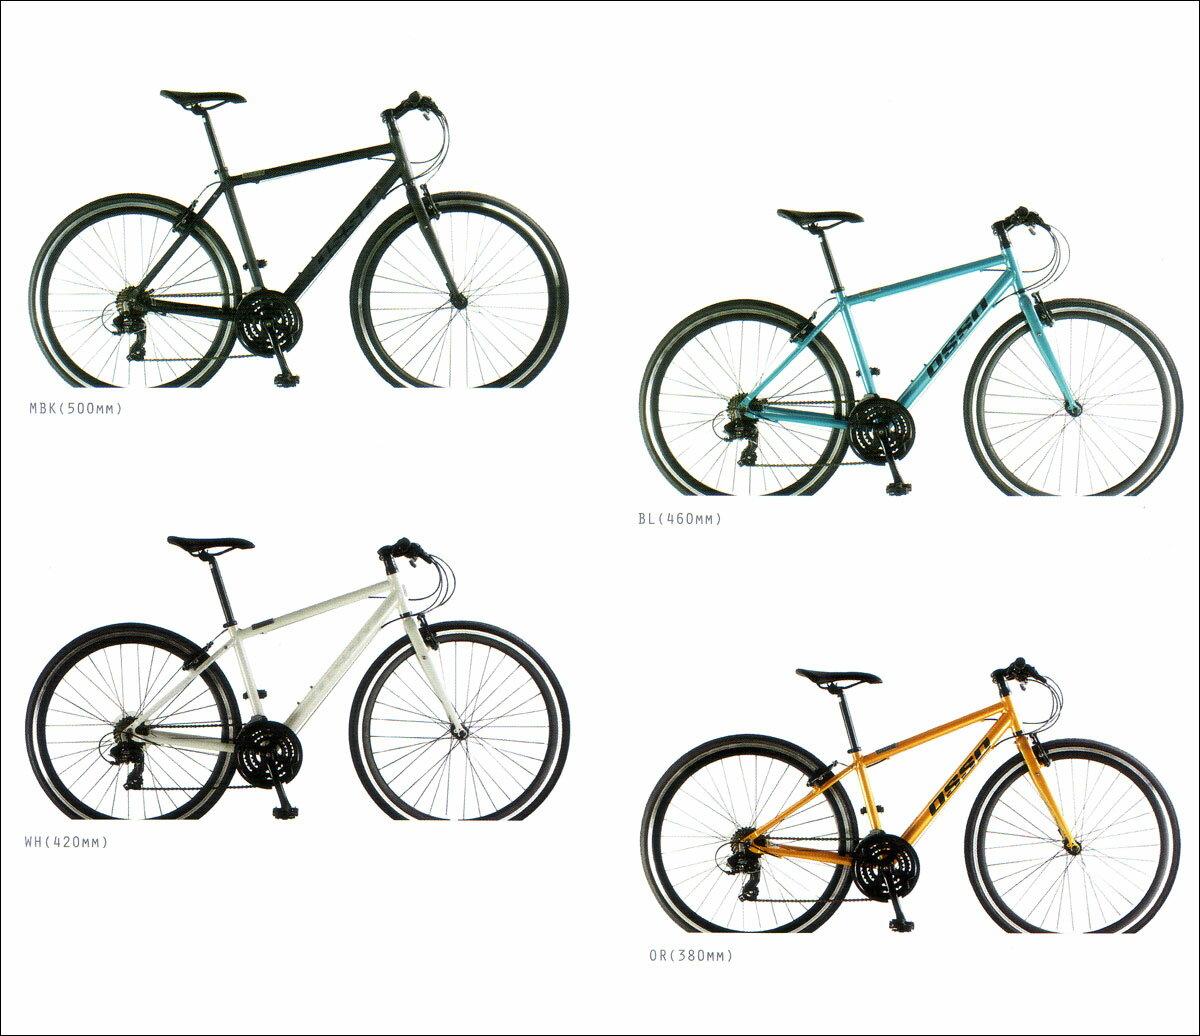 OSSO(オッソ) V330-AL【クロスバイク】【運動/健康/美容】 OSSO(オッソ) V330-AL【クロスバイク】